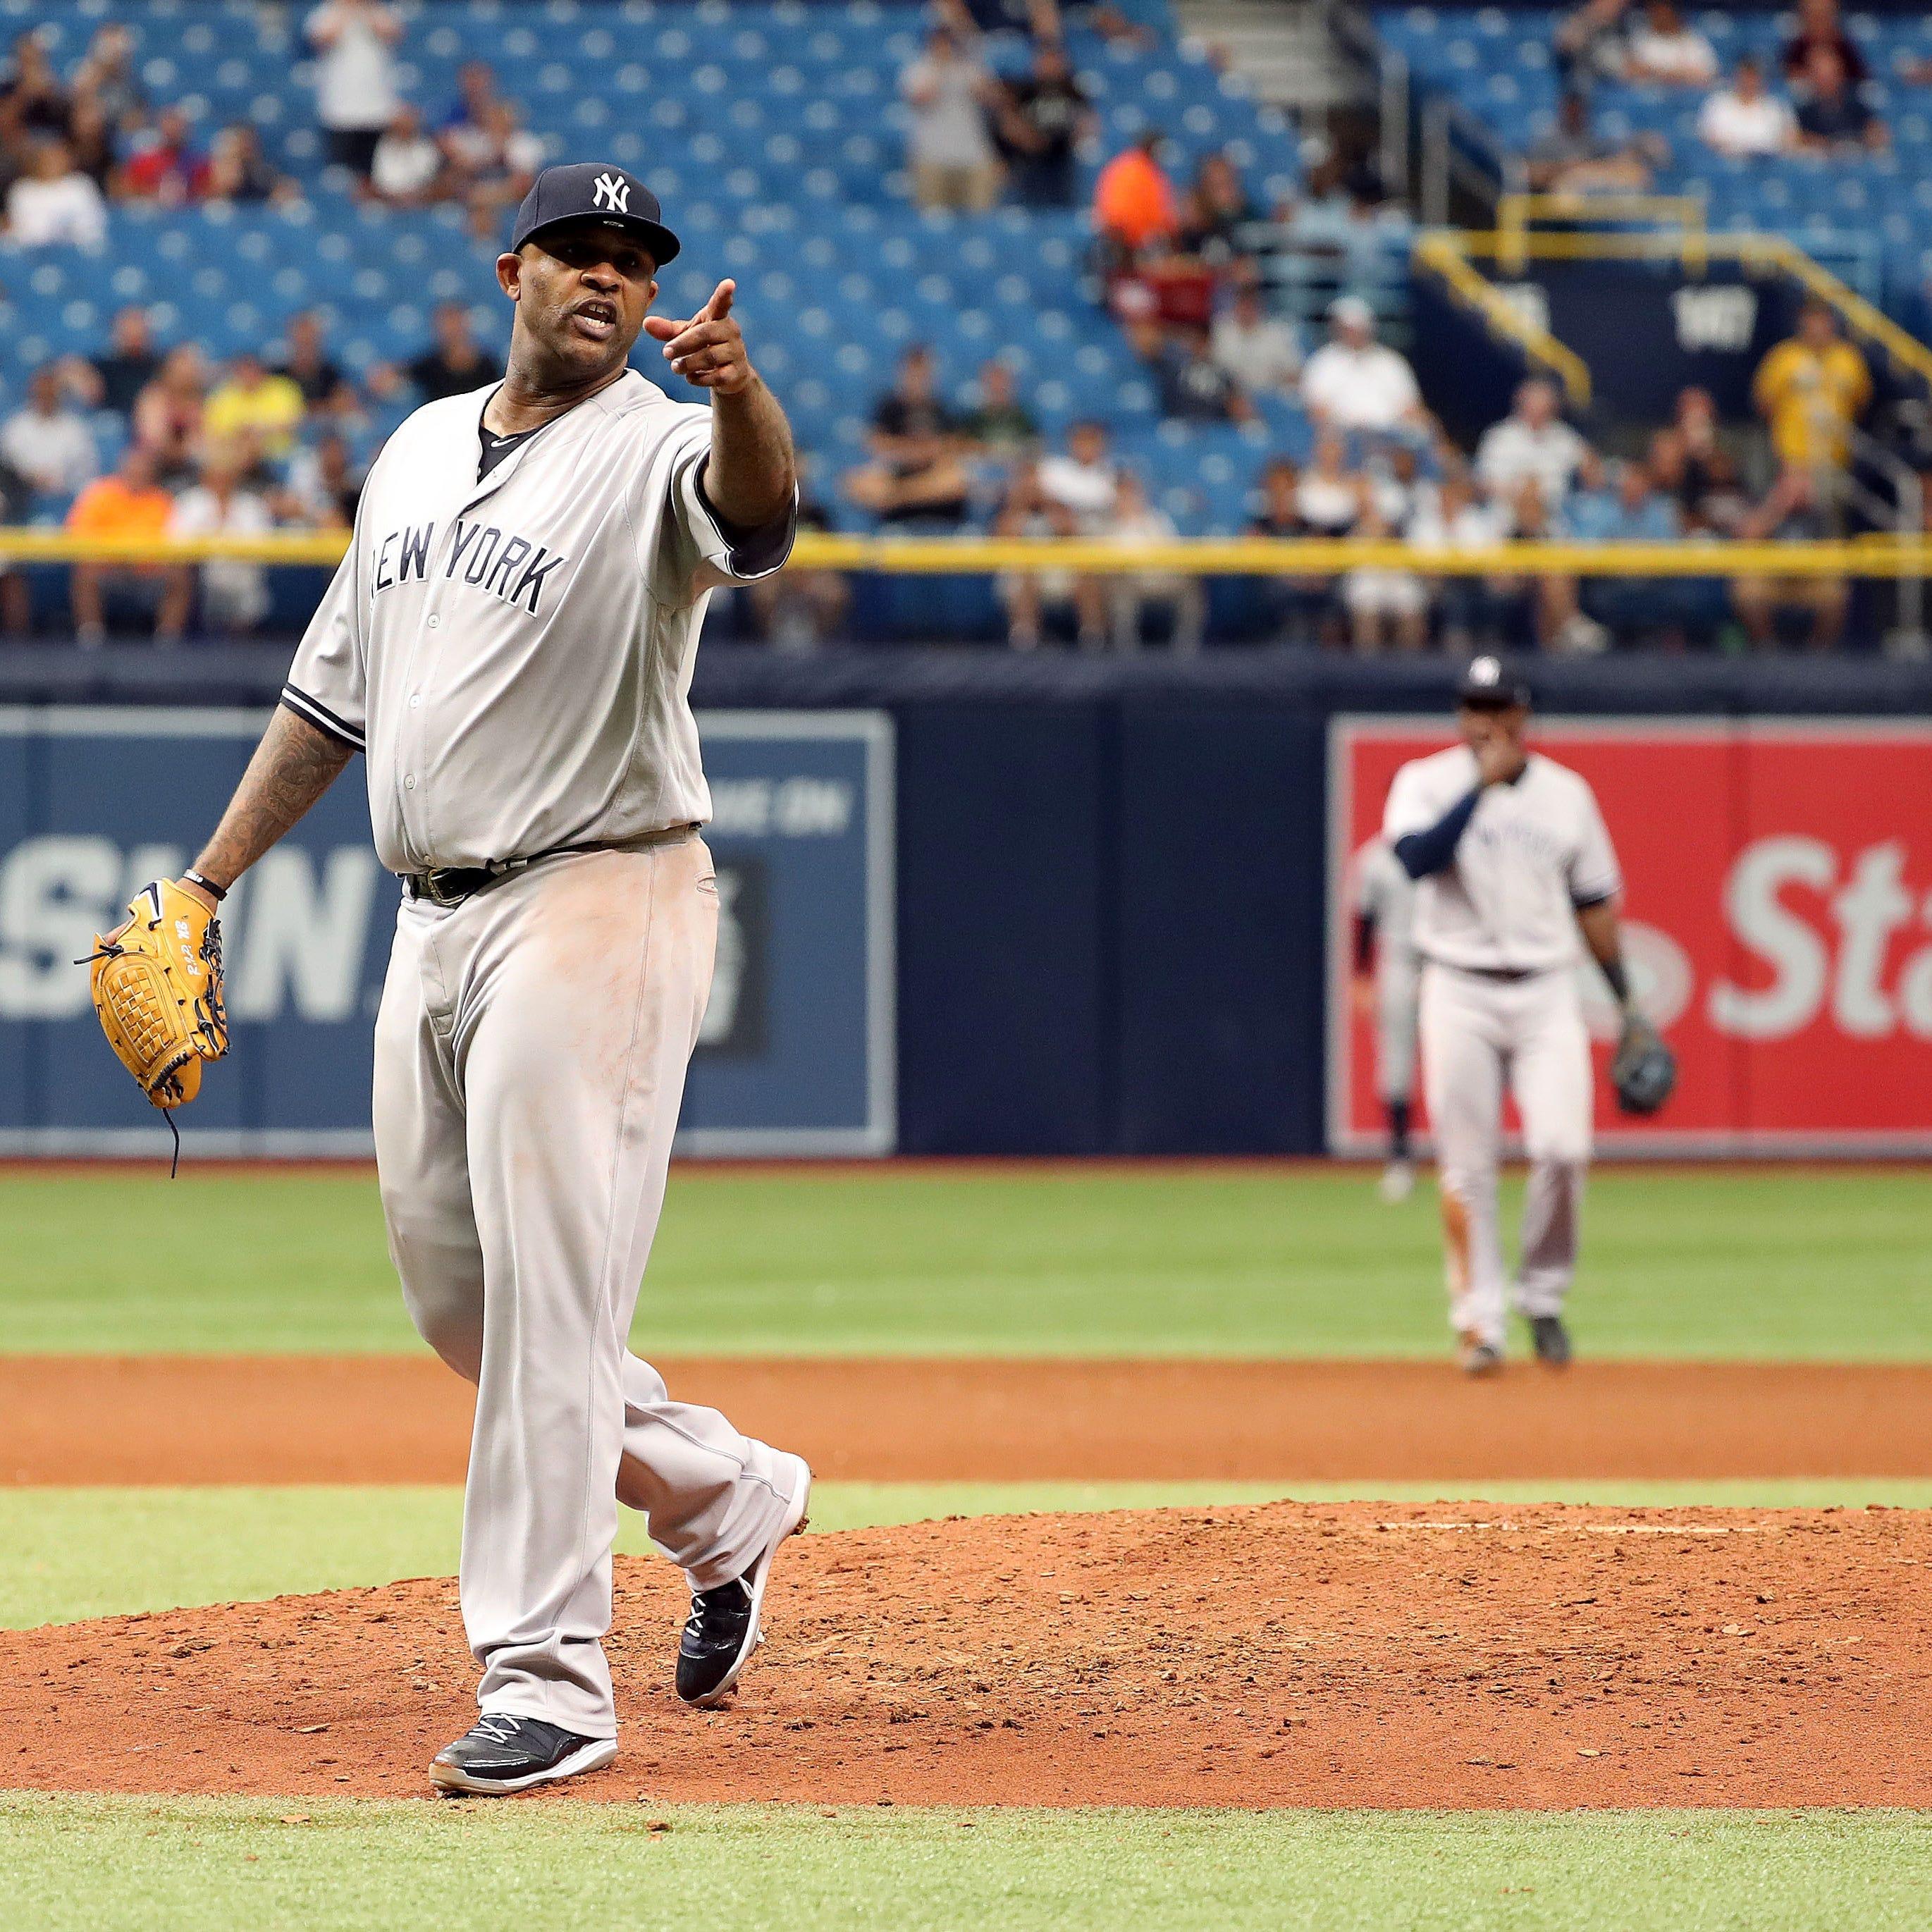 Yankees' CC Sabathia given $500,000 bonus despite September ejection